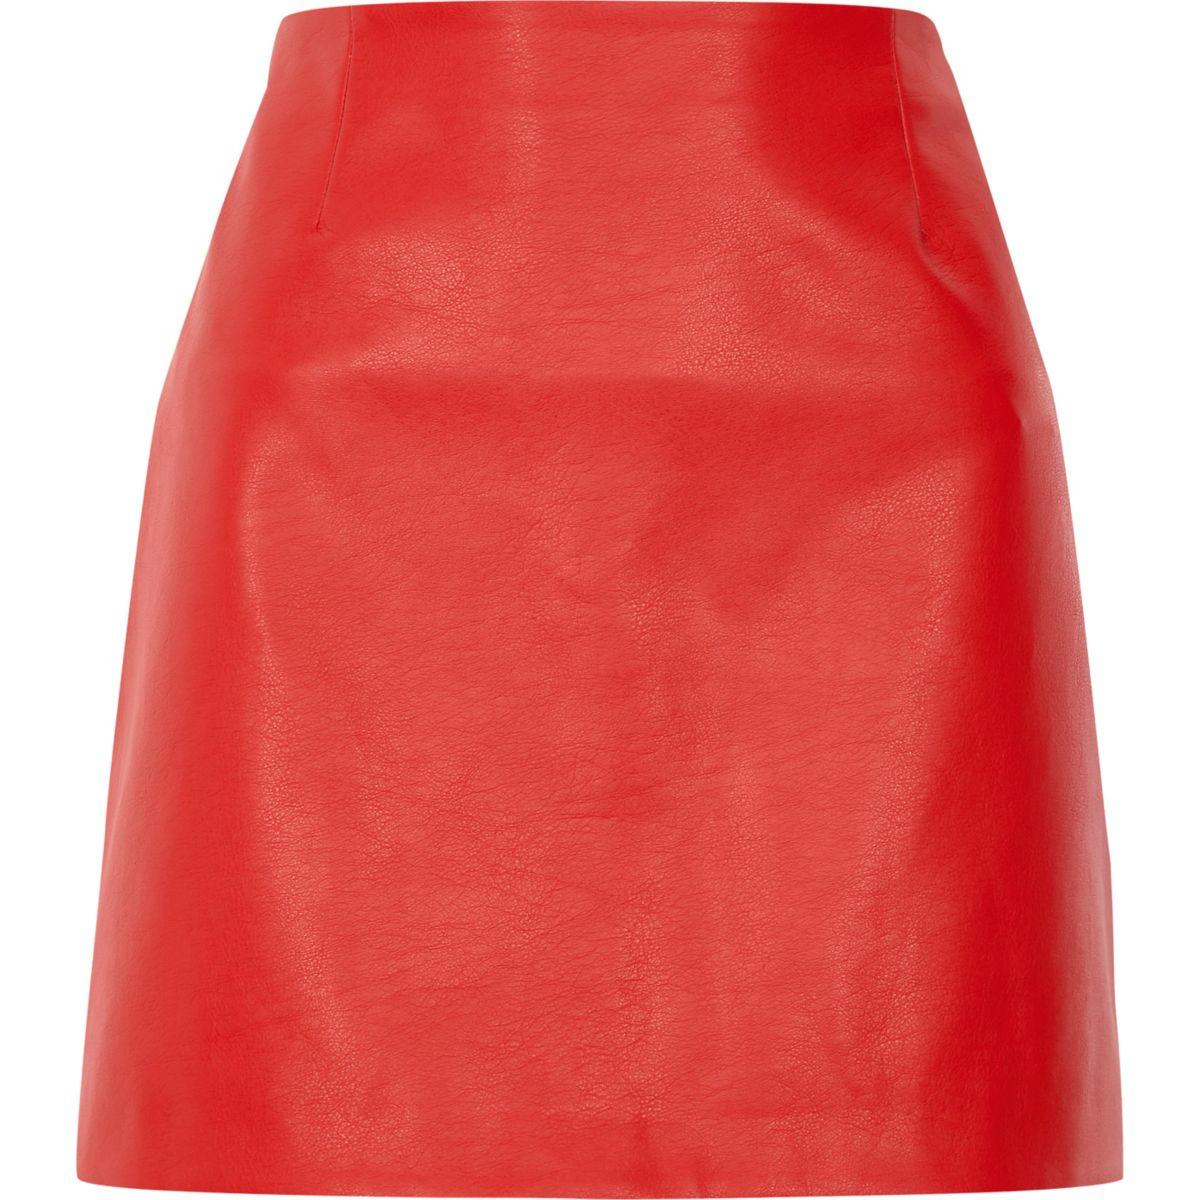 Roter Minirock aus Kunstleder